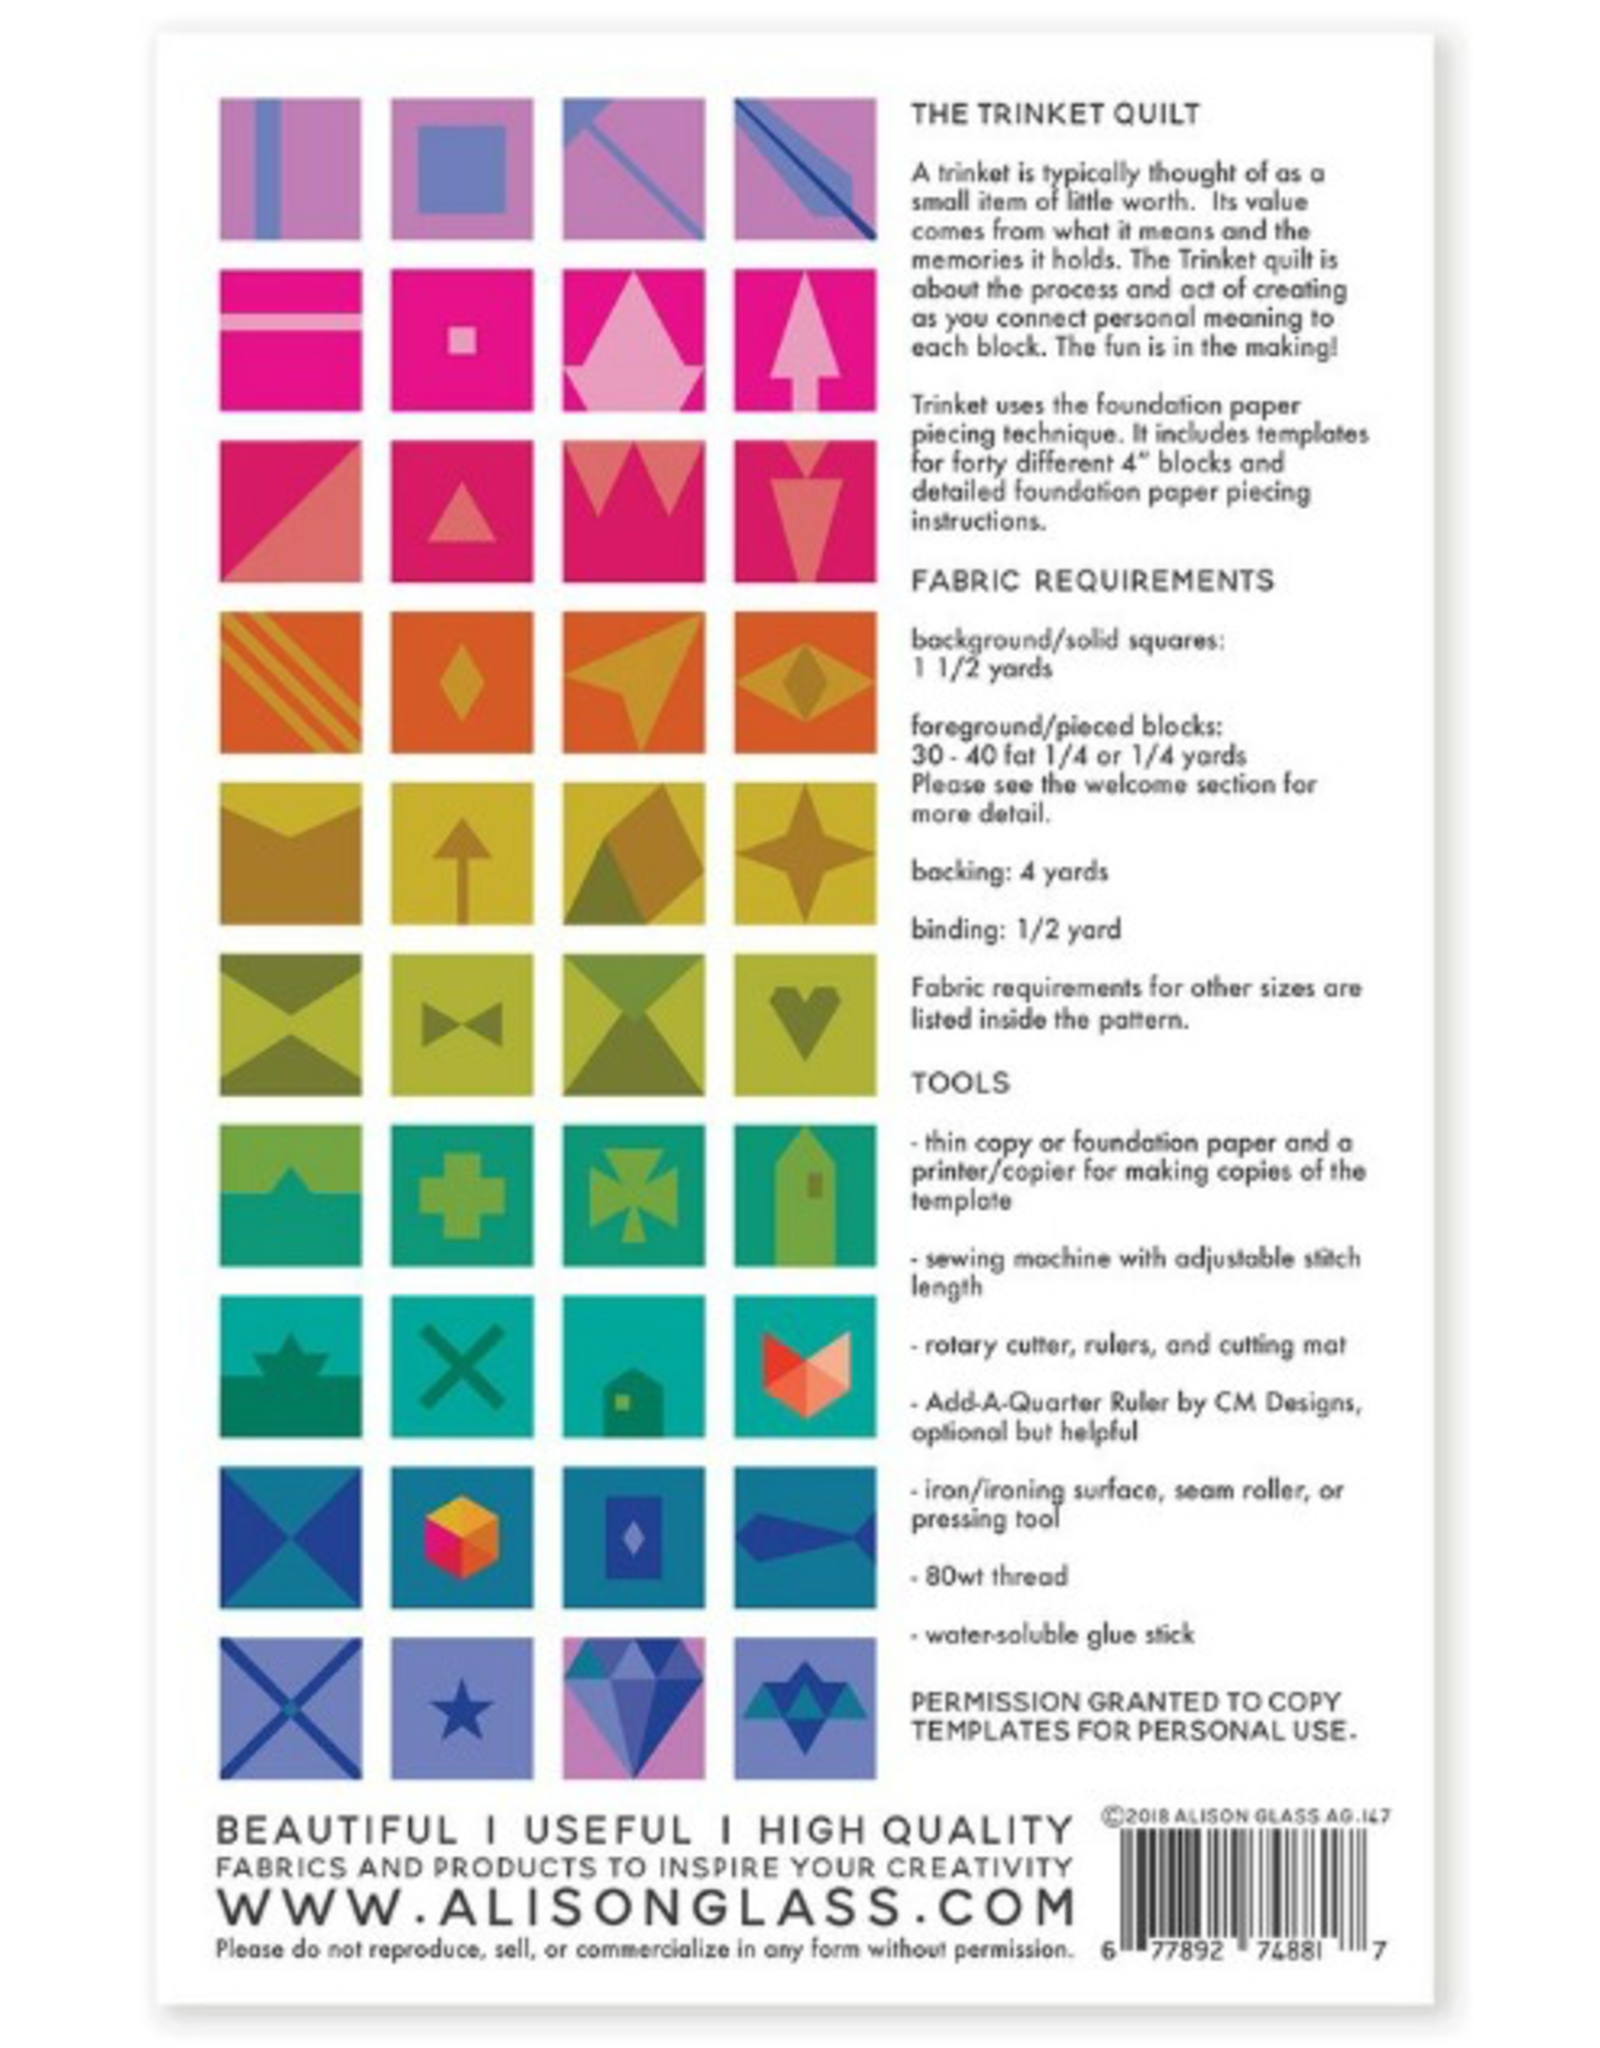 Alison Glass Trinket Quilt Pattern